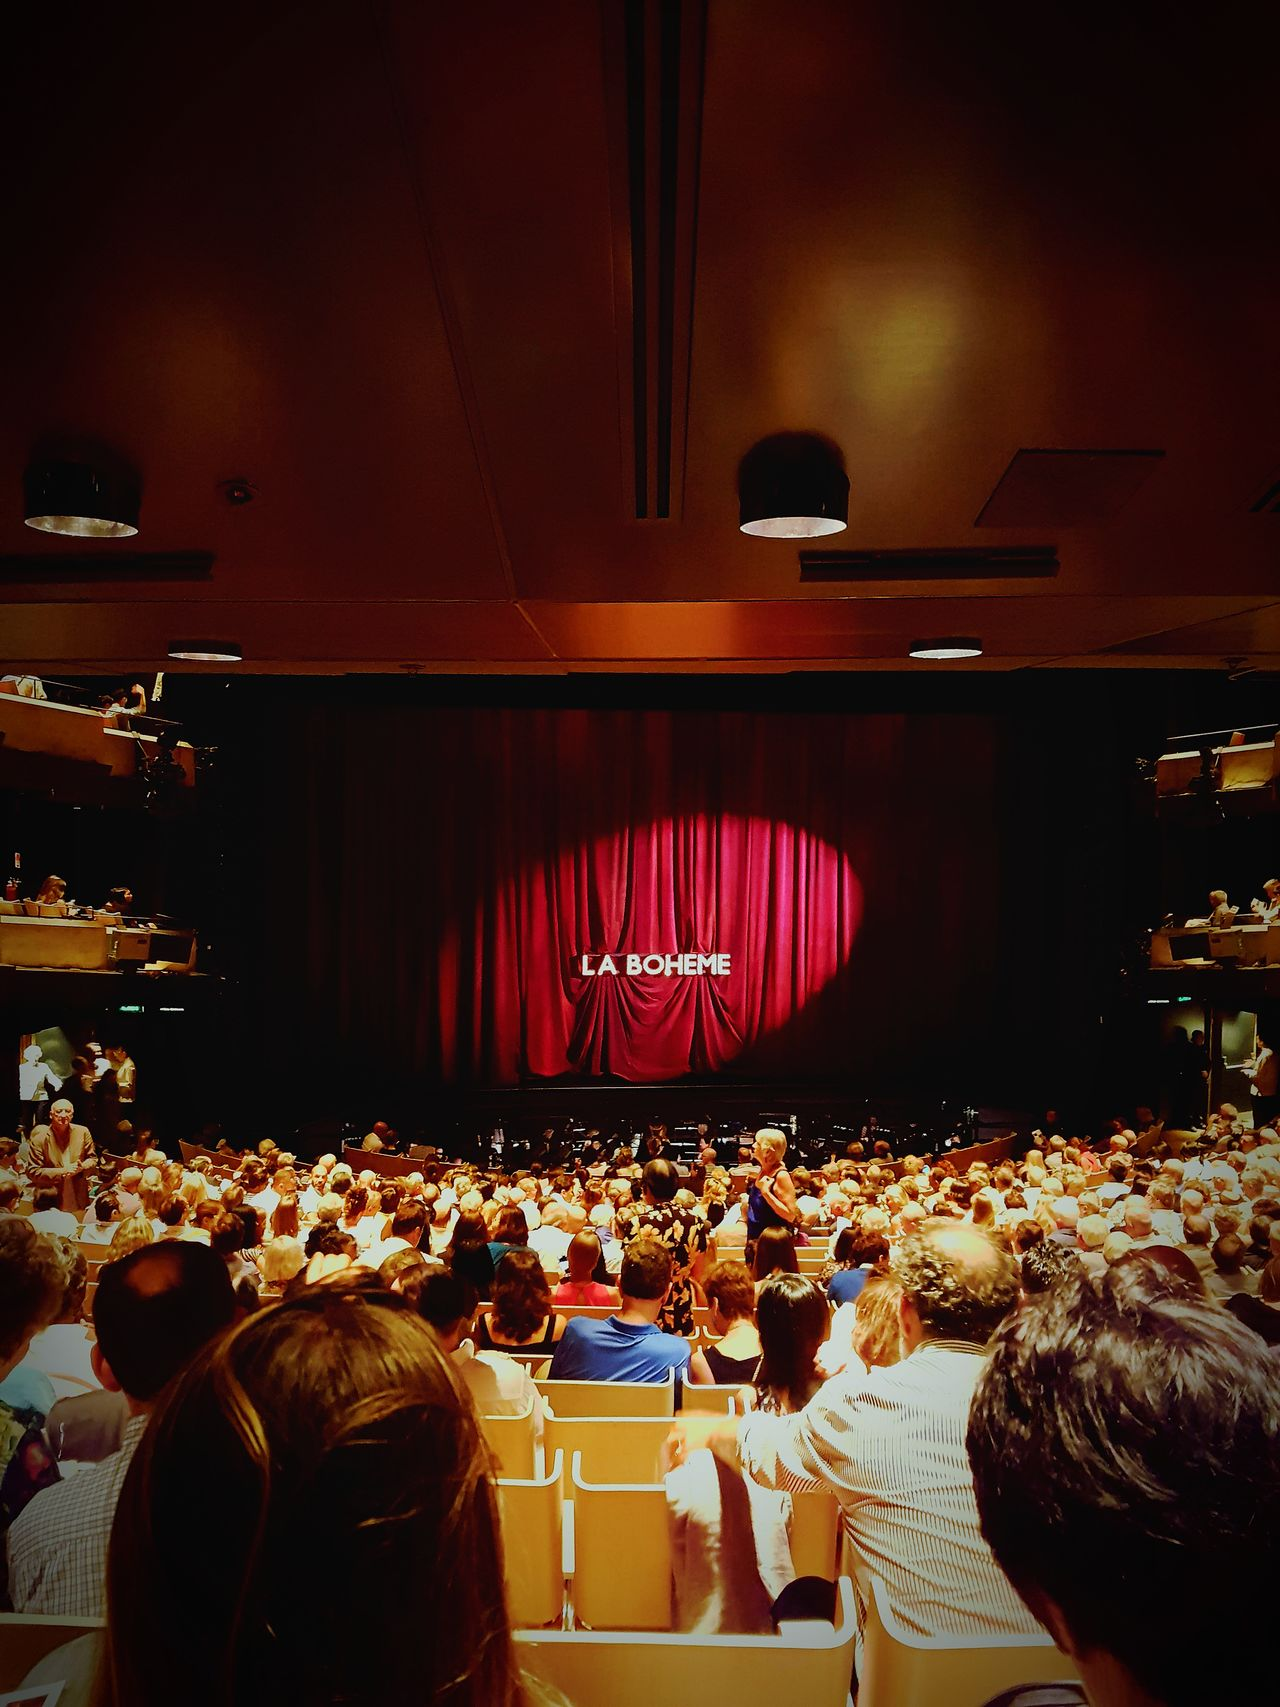 La Boheme 🎶🎵🎶 Music Cool Experience Arts Culture And Entertainment Indoors  Nightlife Opéra Sydney Photography Sydney Opera House CaptureTheMoment Australia